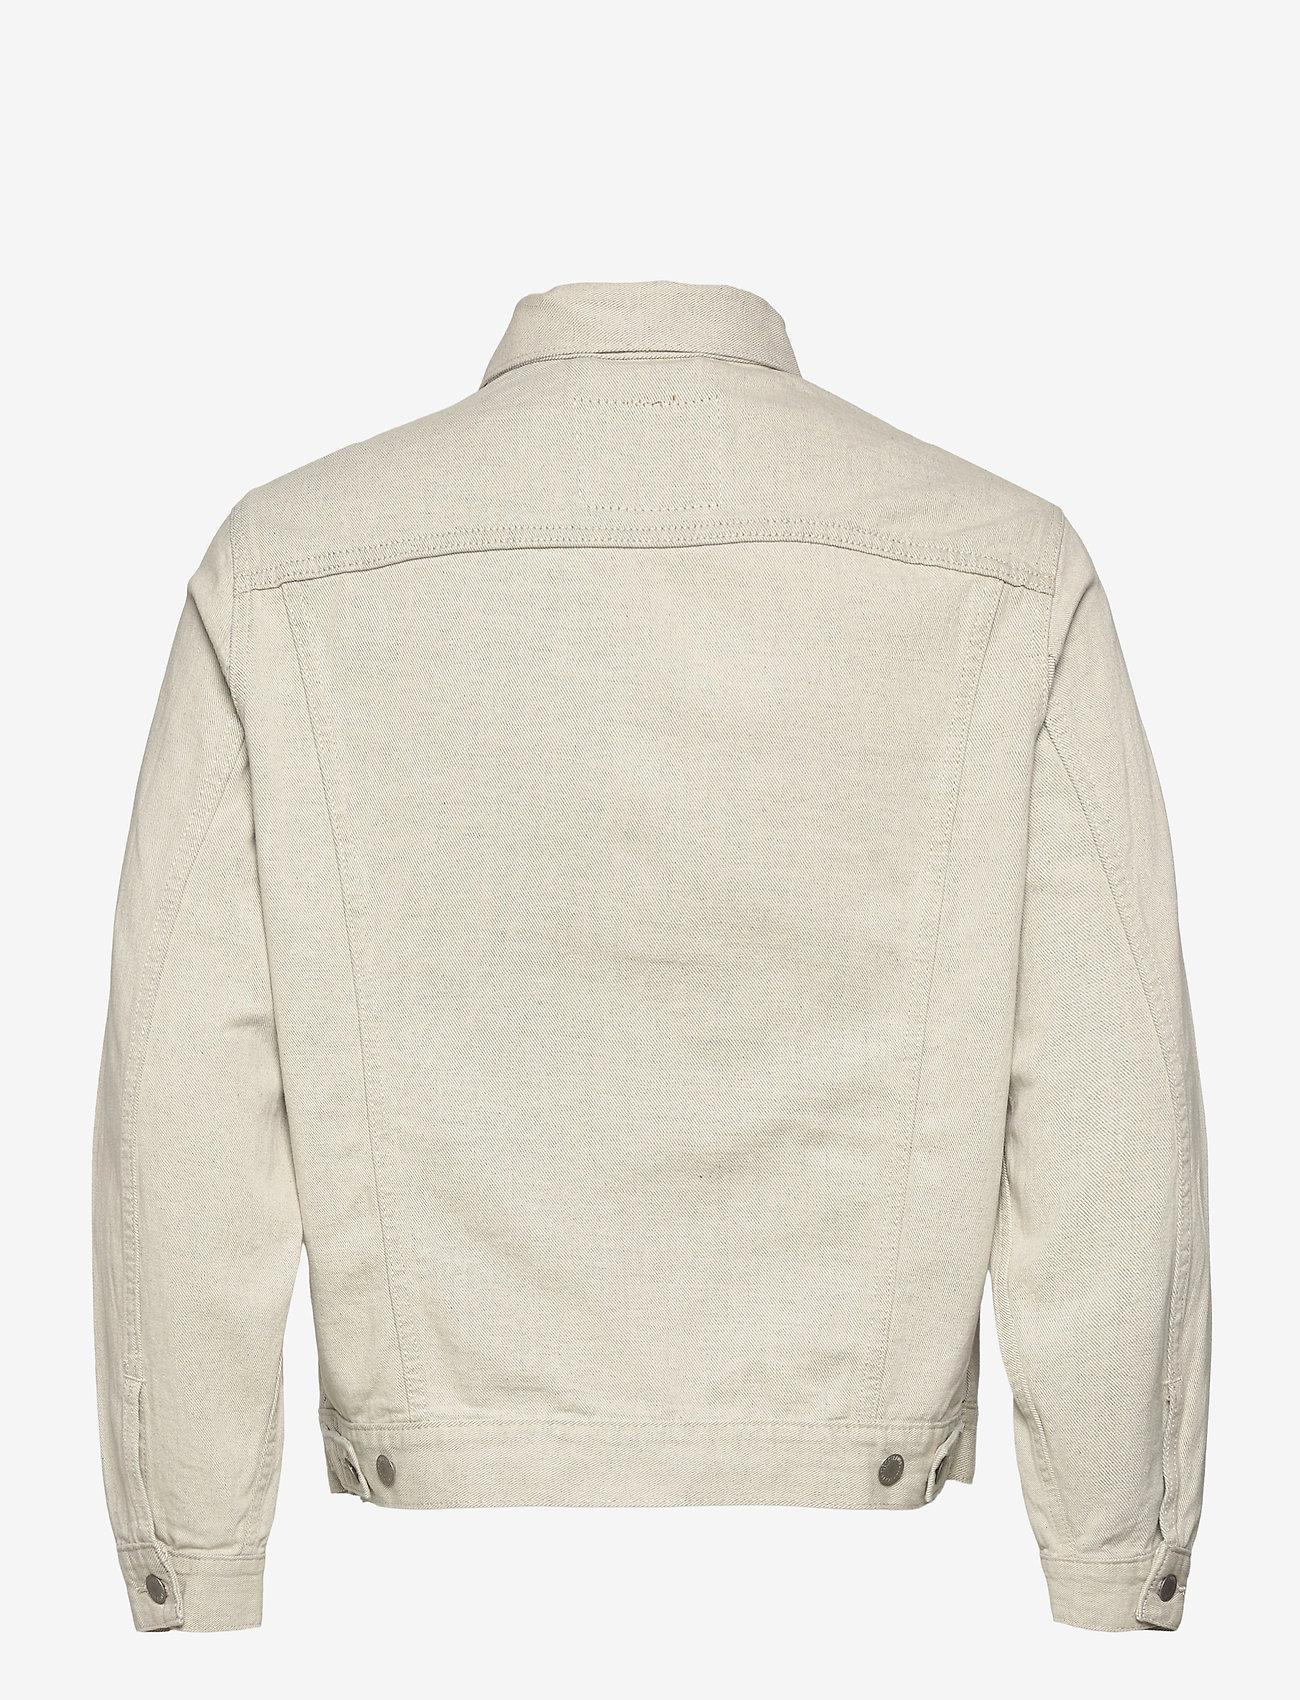 LEVI´S Men - VINTAGE FIT TRUCKER LEFTOVERS - kurtki dżinsowe - greys - 1